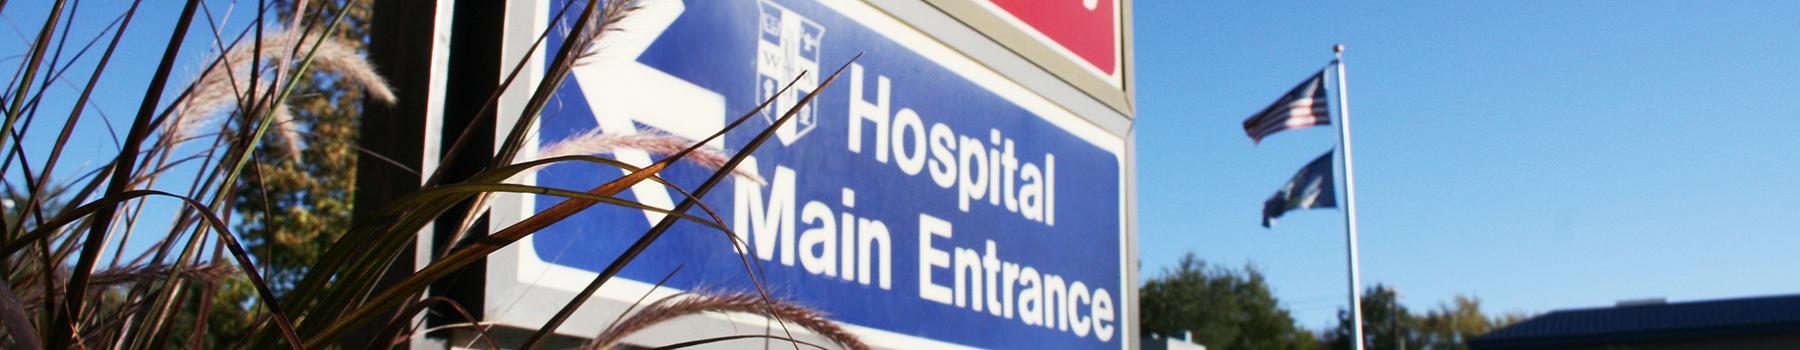 William Newton Hospital entrance